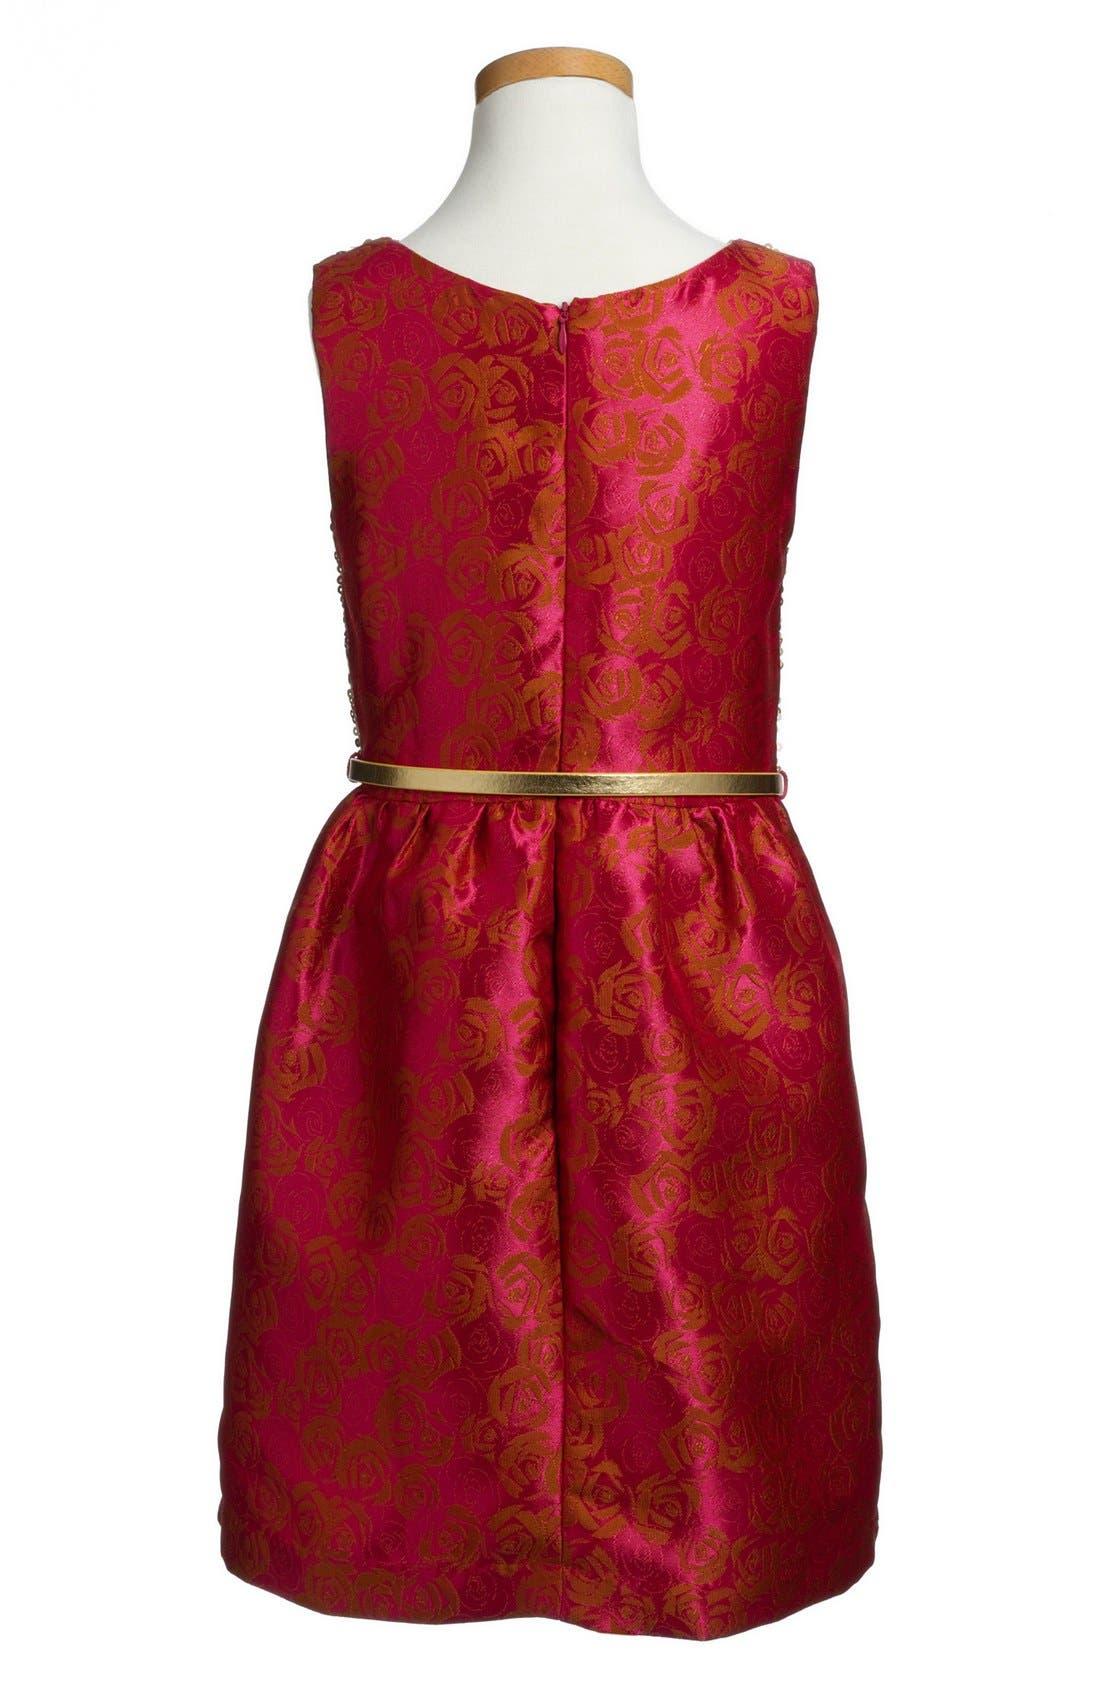 Alternate Image 2  - BLUSH by Us Angels Sequin & Brocade Dress (Big Girls)